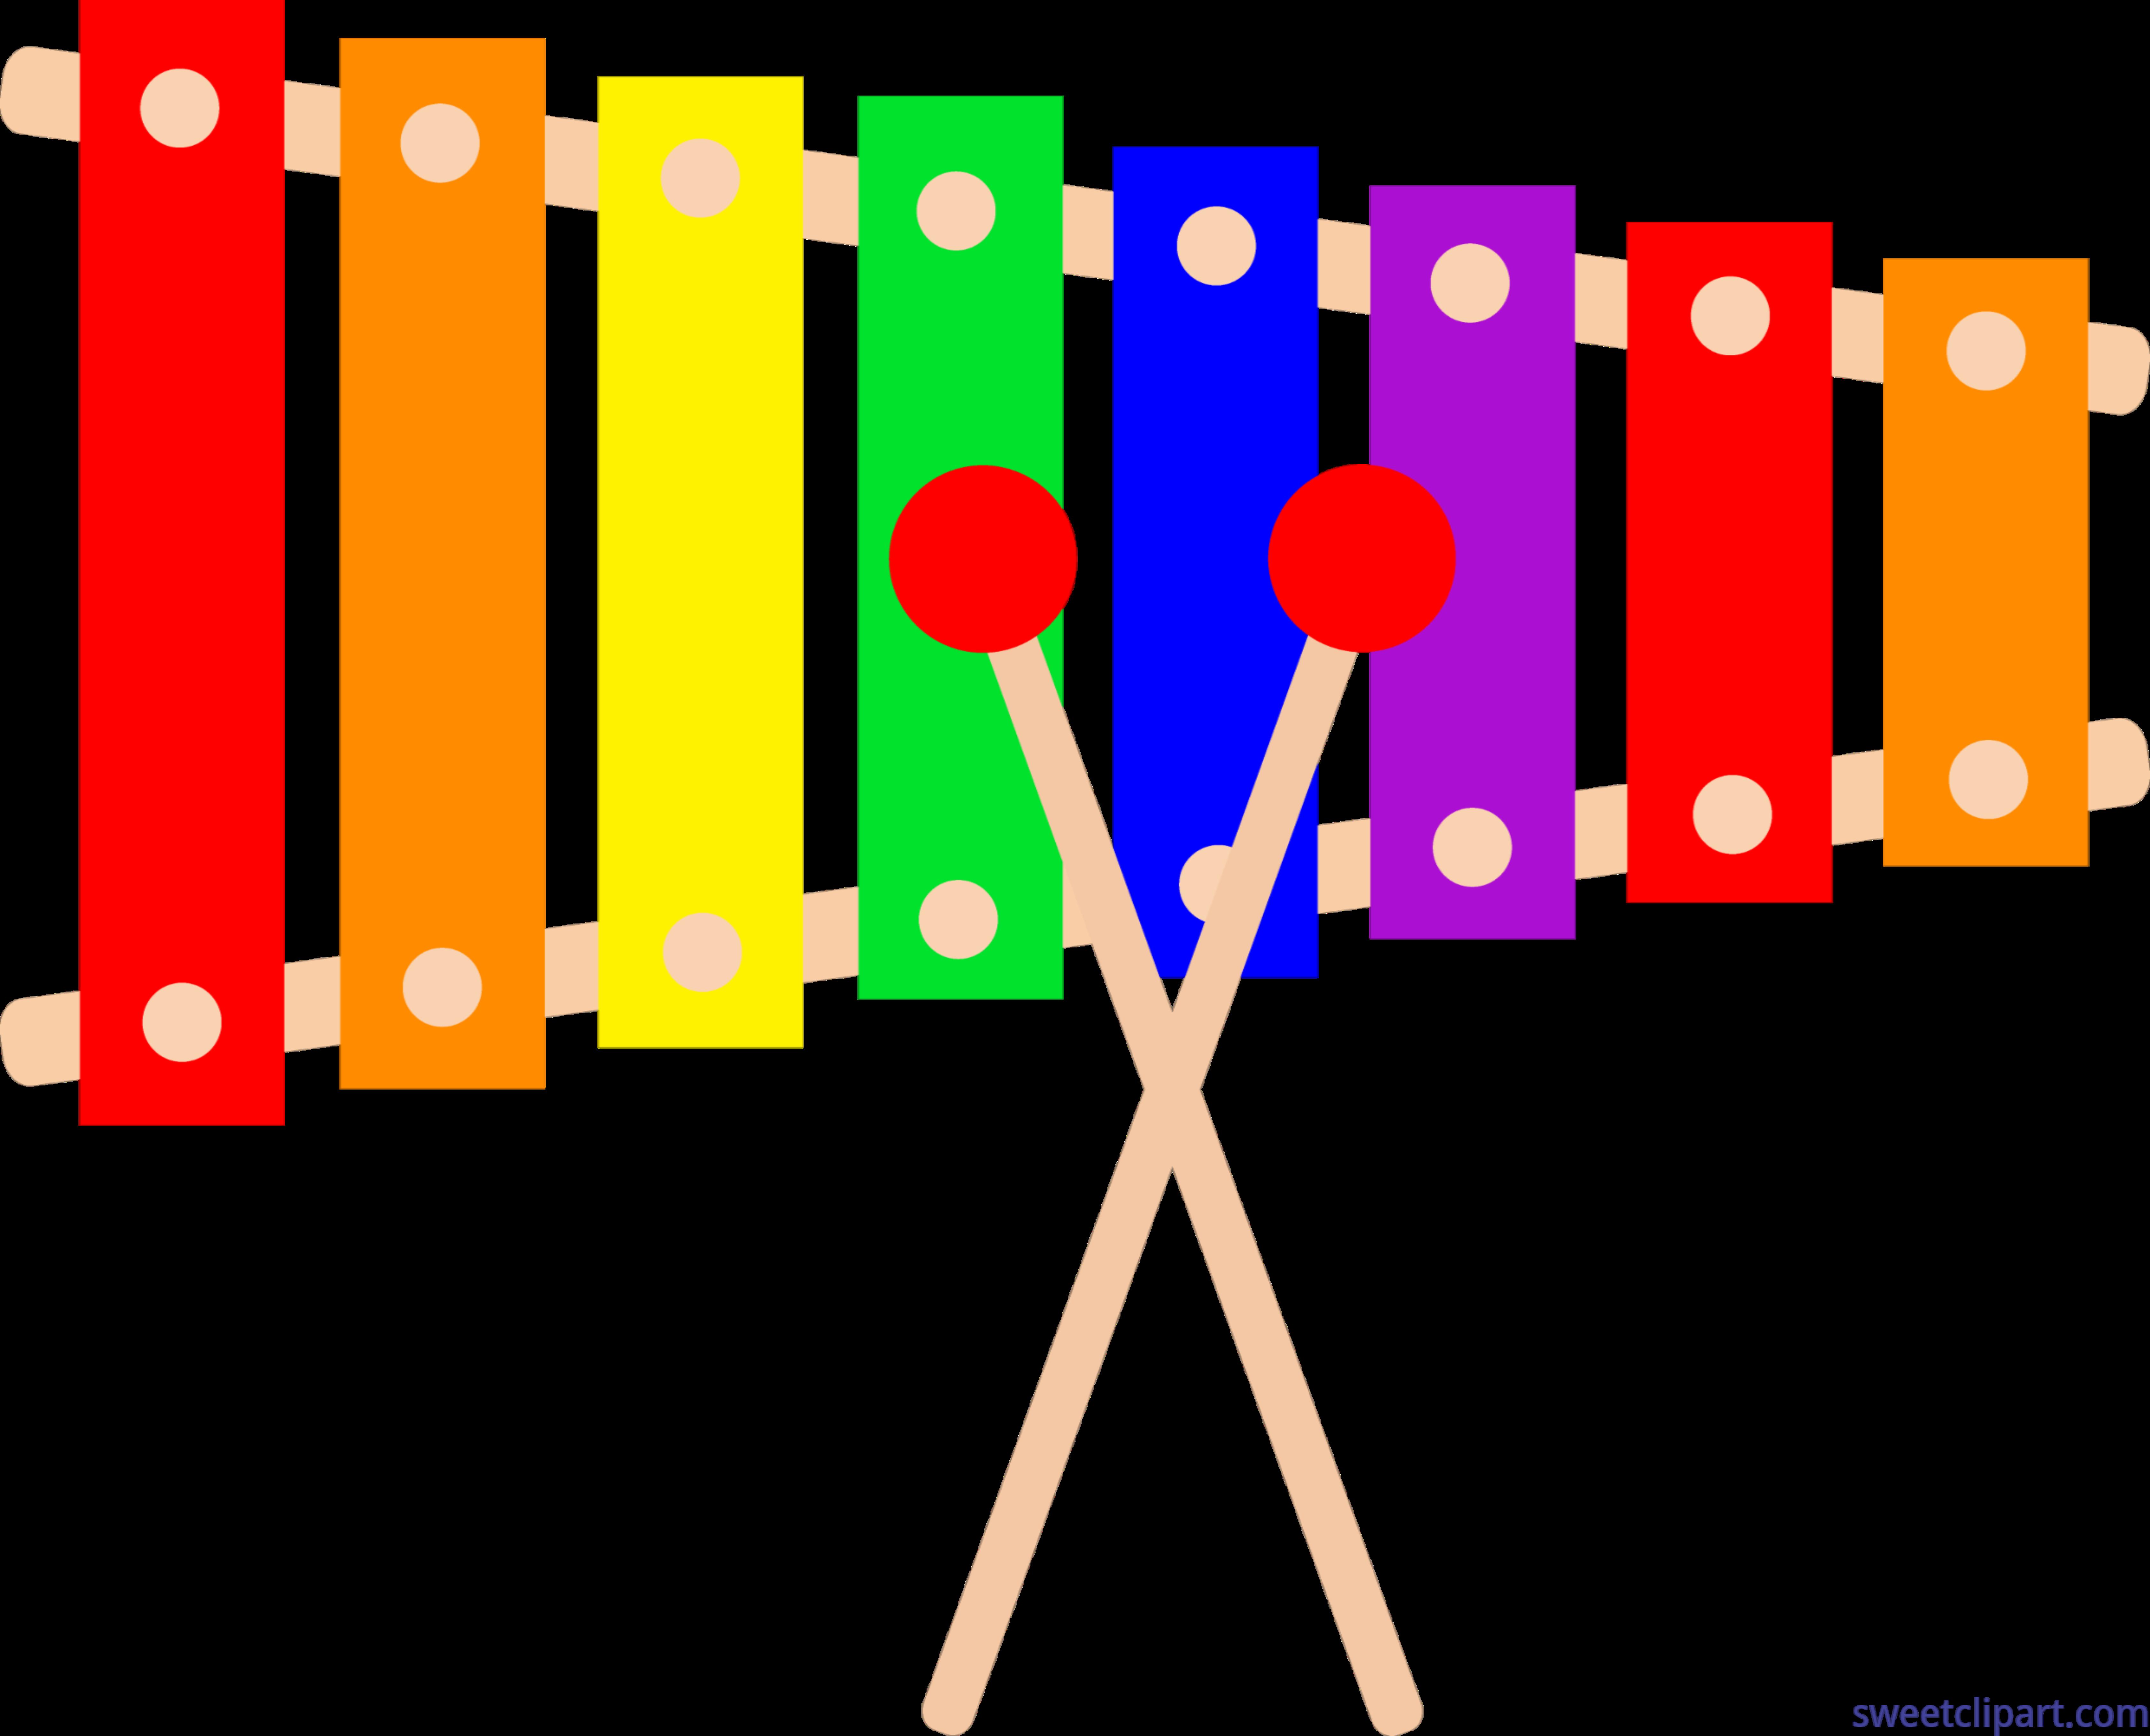 Xylophone clipart. Clip art sweet